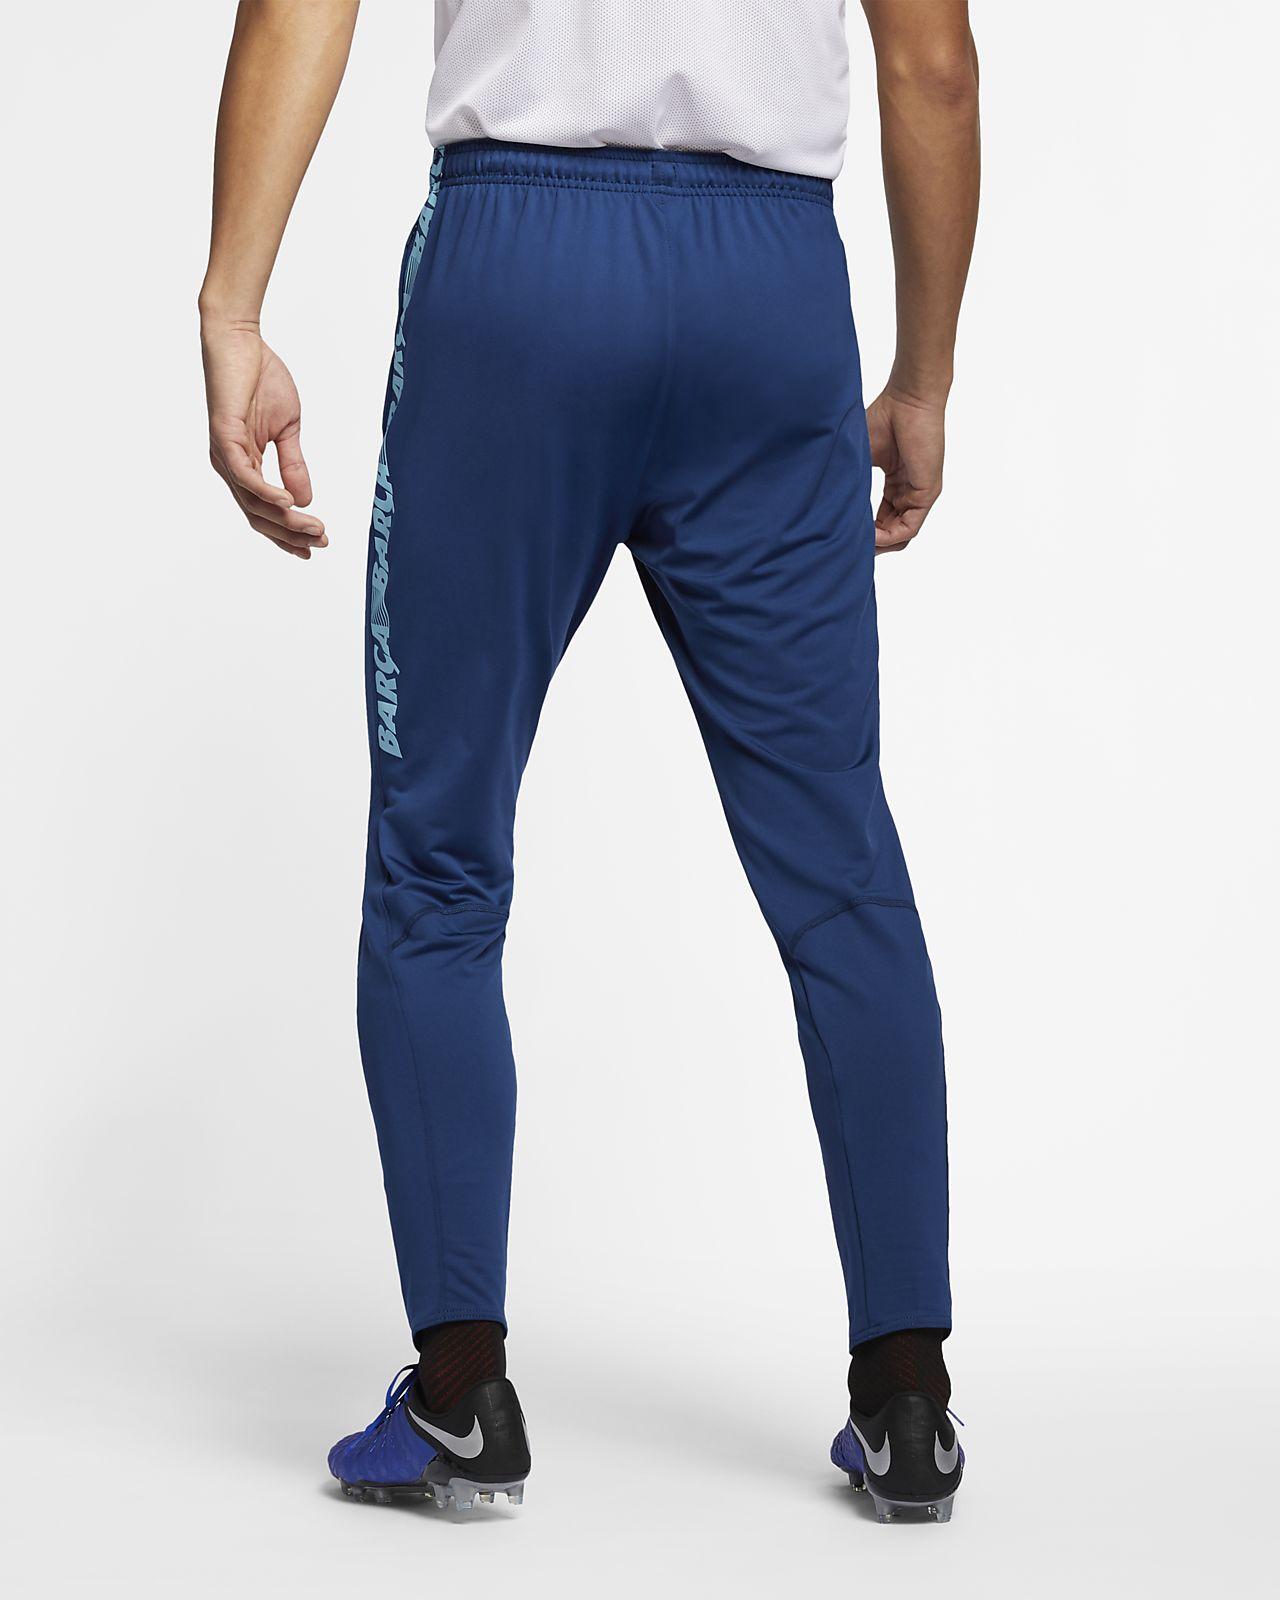 071815e2ff281 Pantalon de football FC Barcelona Dri-FIT Squad pour Homme. Nike.com MA